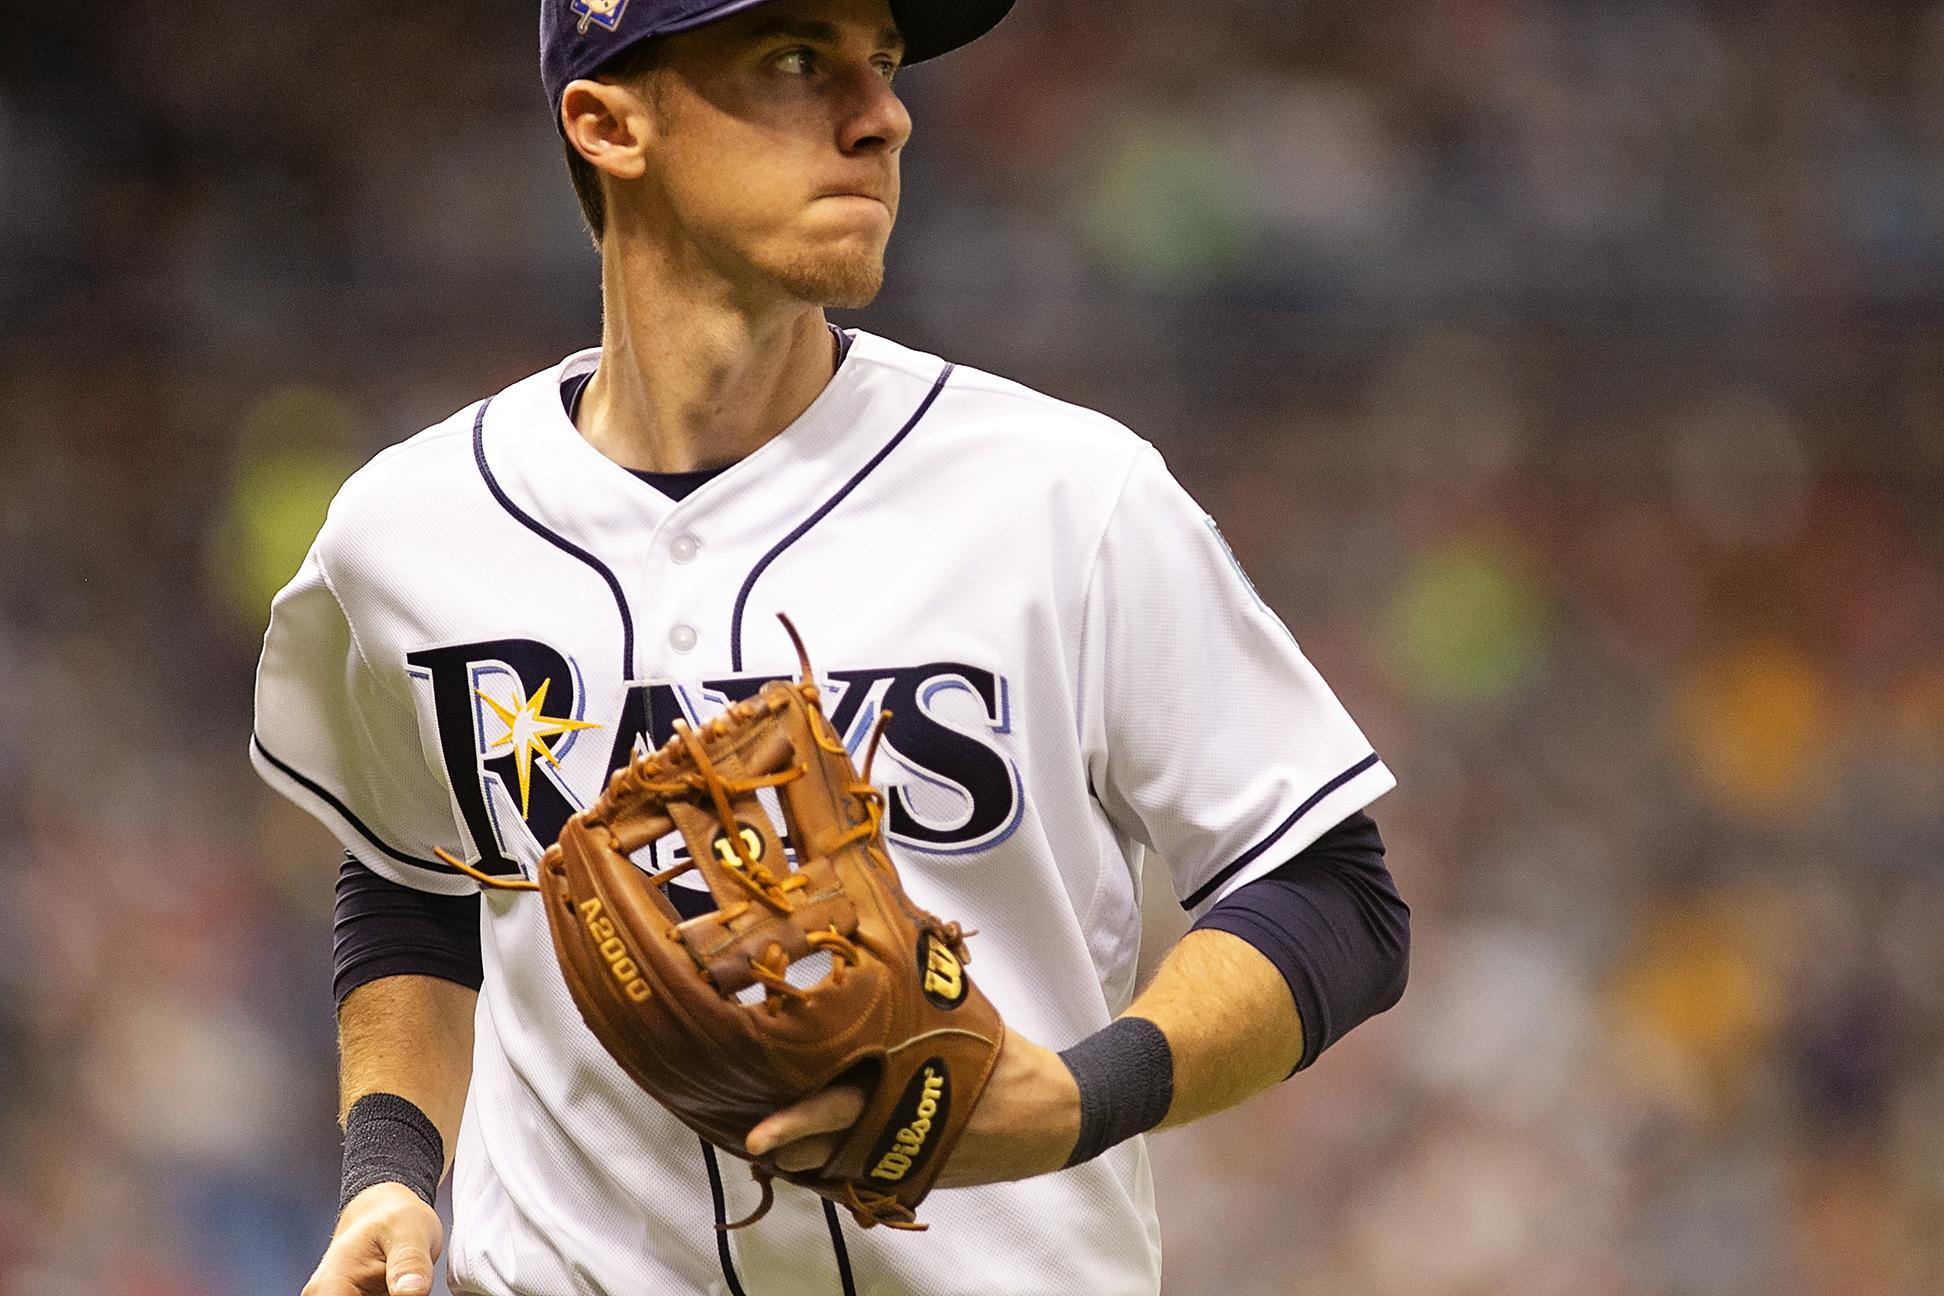 Duffy had three hits for the Rays./CARMEN MANDATO